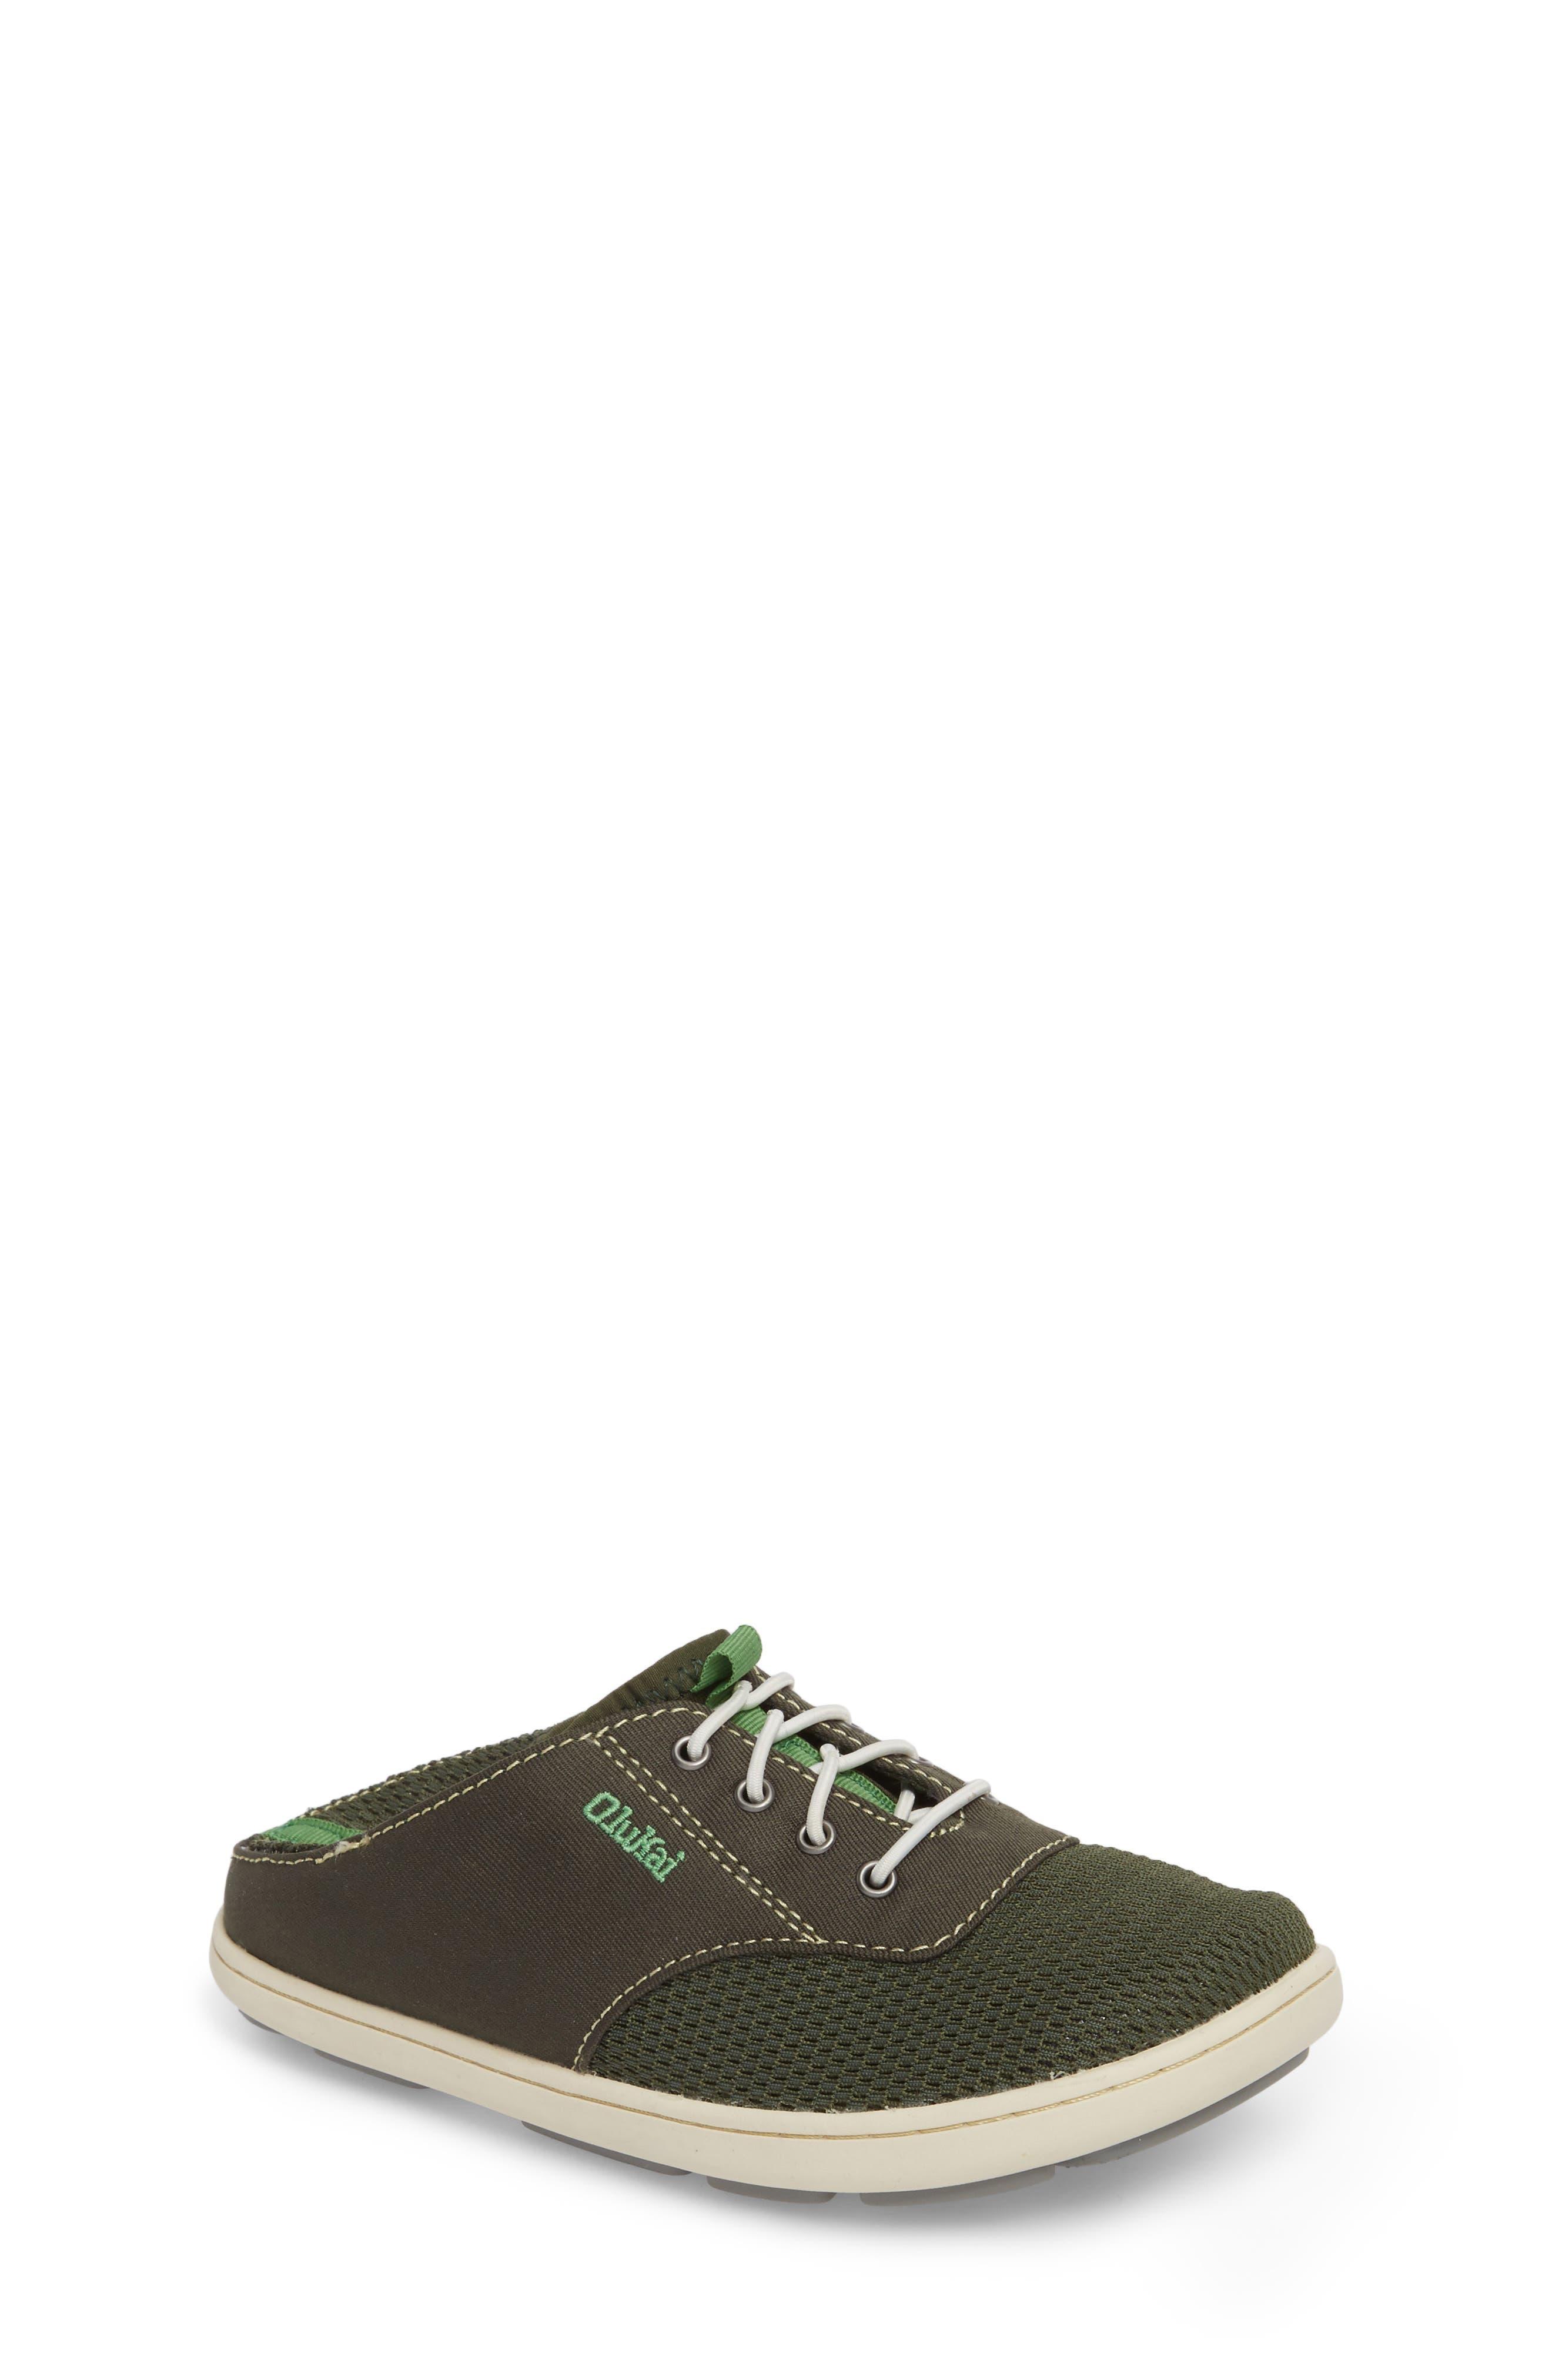 Nohea Moku Water Resistant Shoe,                         Main,                         color, SEA GRASS/ SEA GRASS